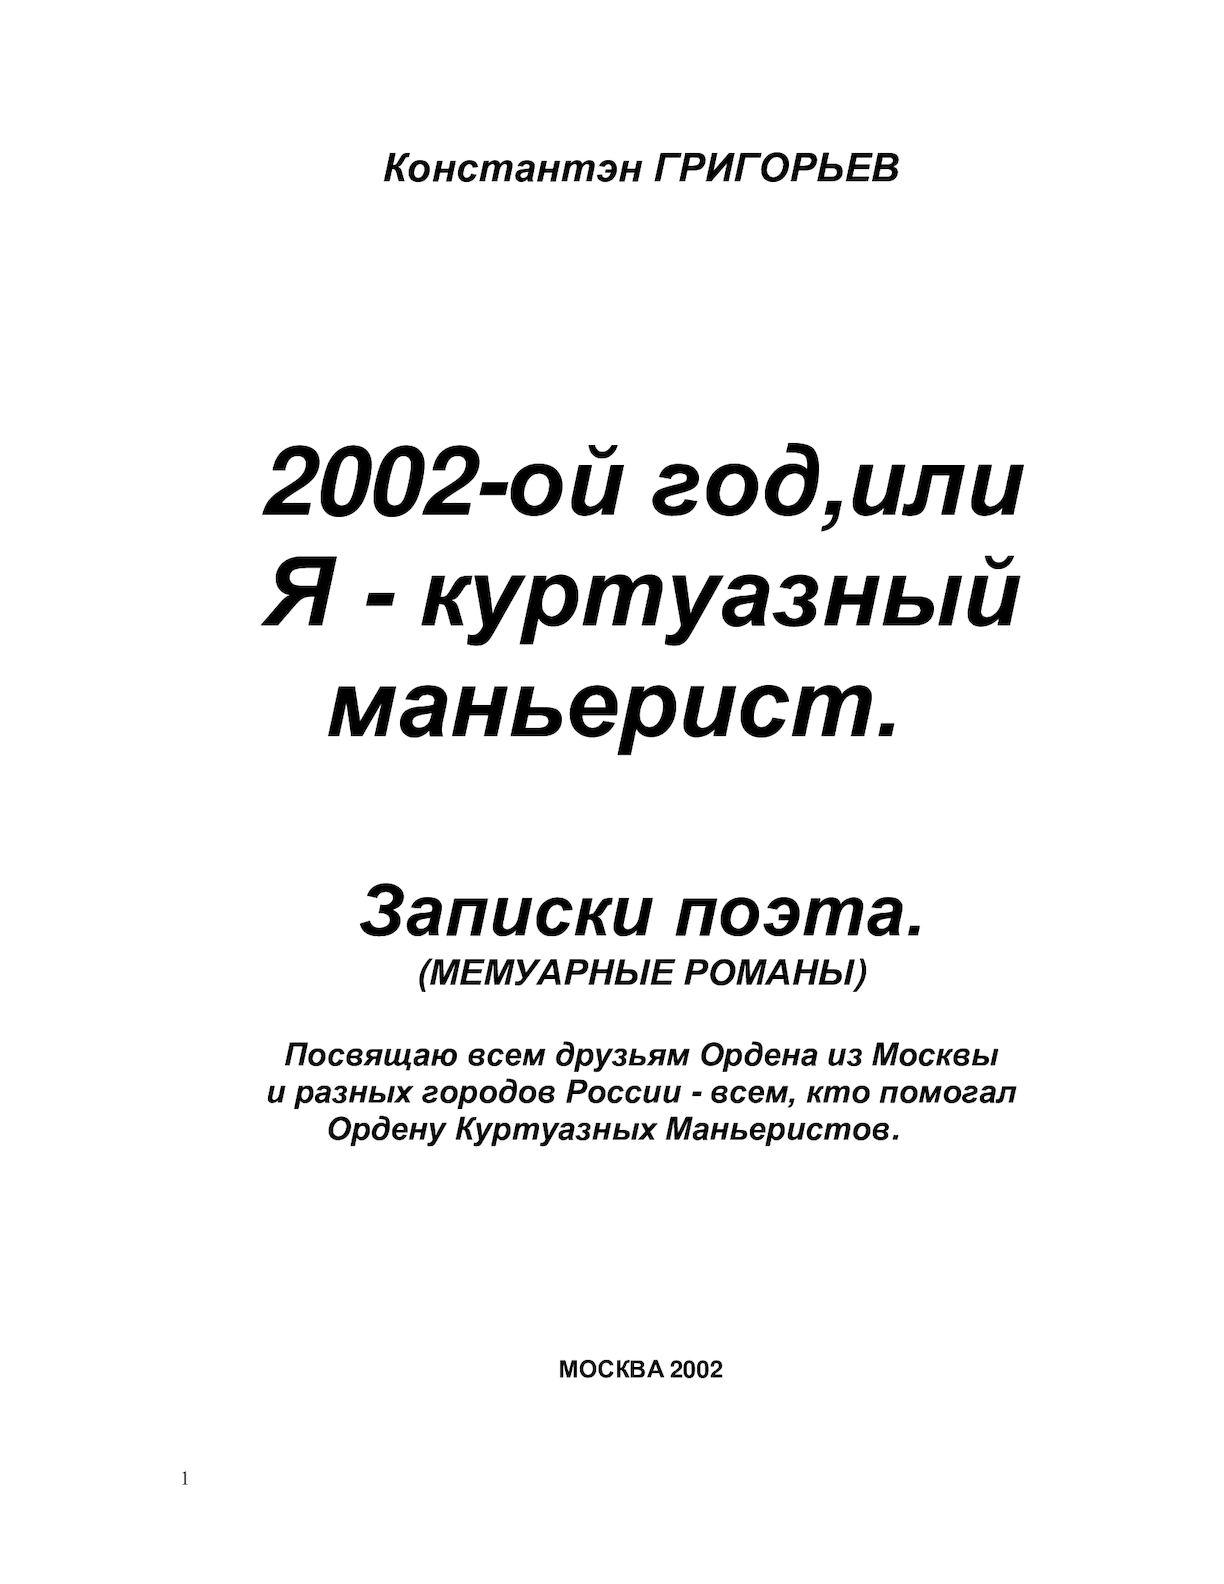 1081aeec7879 Calaméo - К.Григорьев Я куртуазный маньерист